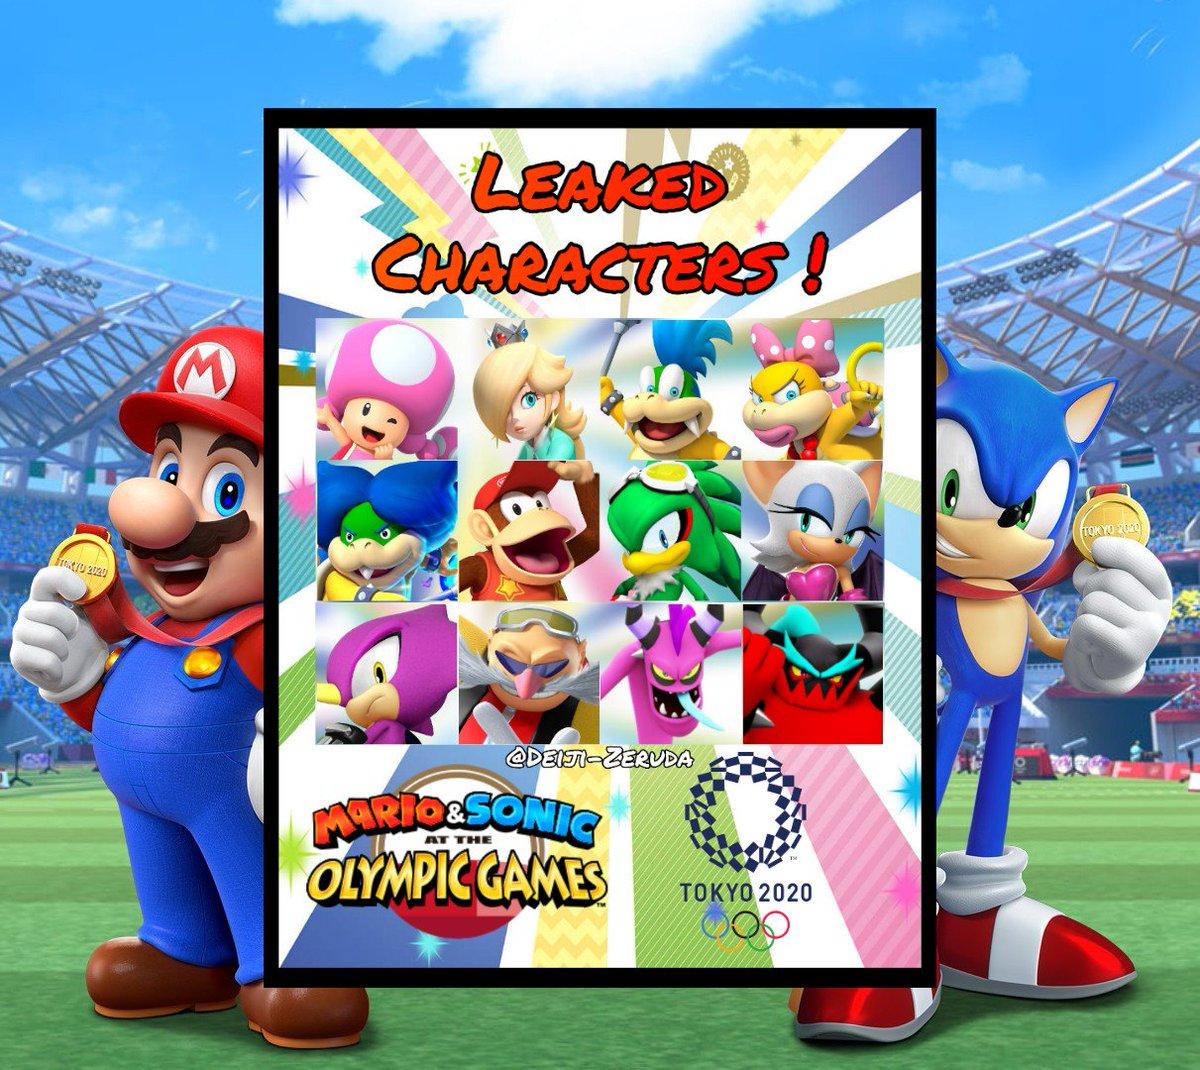 Deiji Zeruda Pa Twitter Leaked Characters For Mario